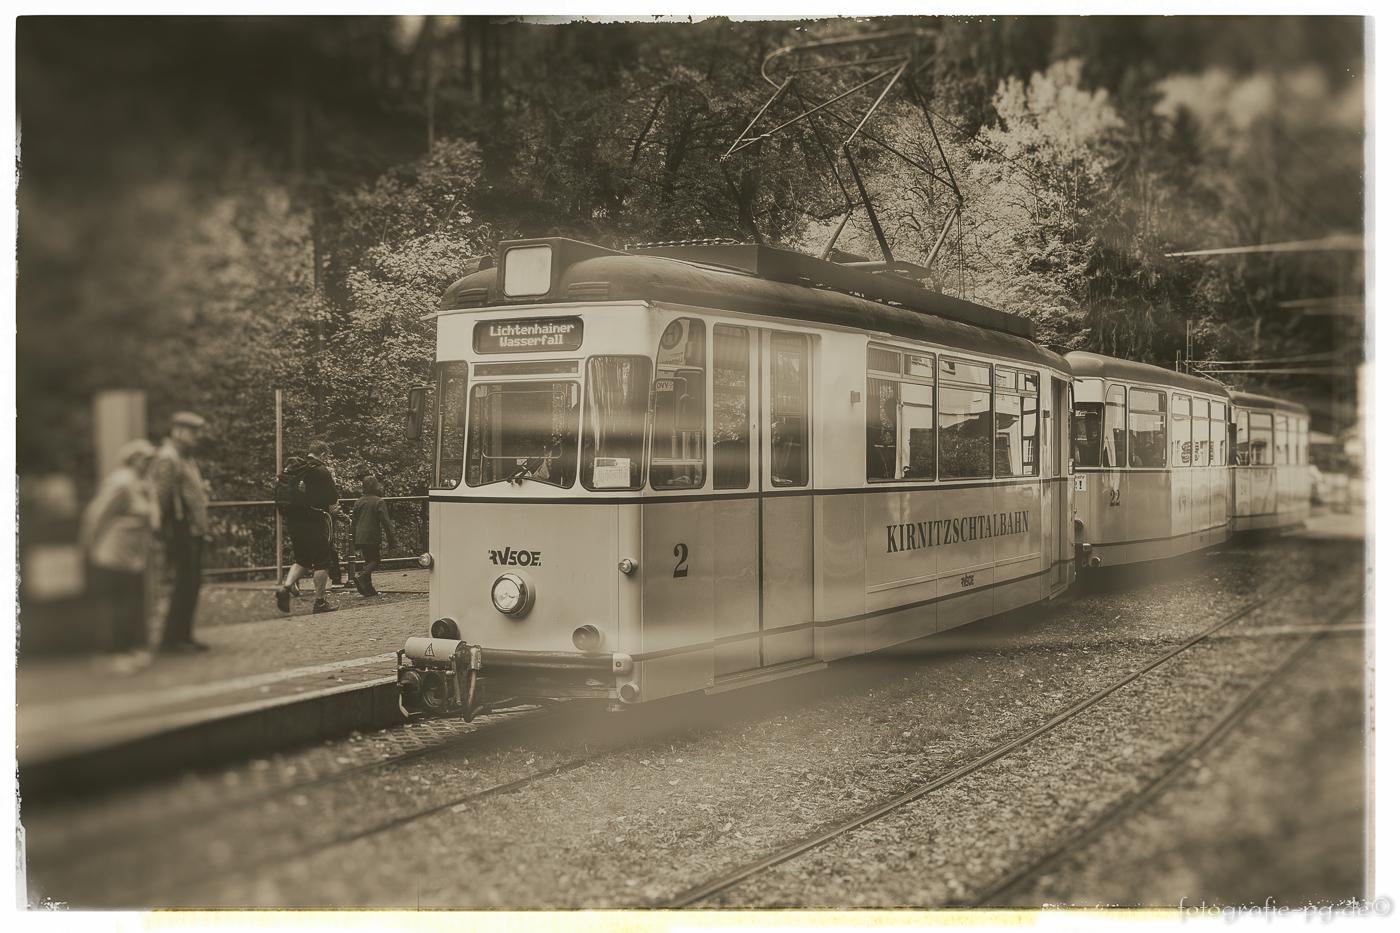 ... die Kirnitzschtalbahn ...